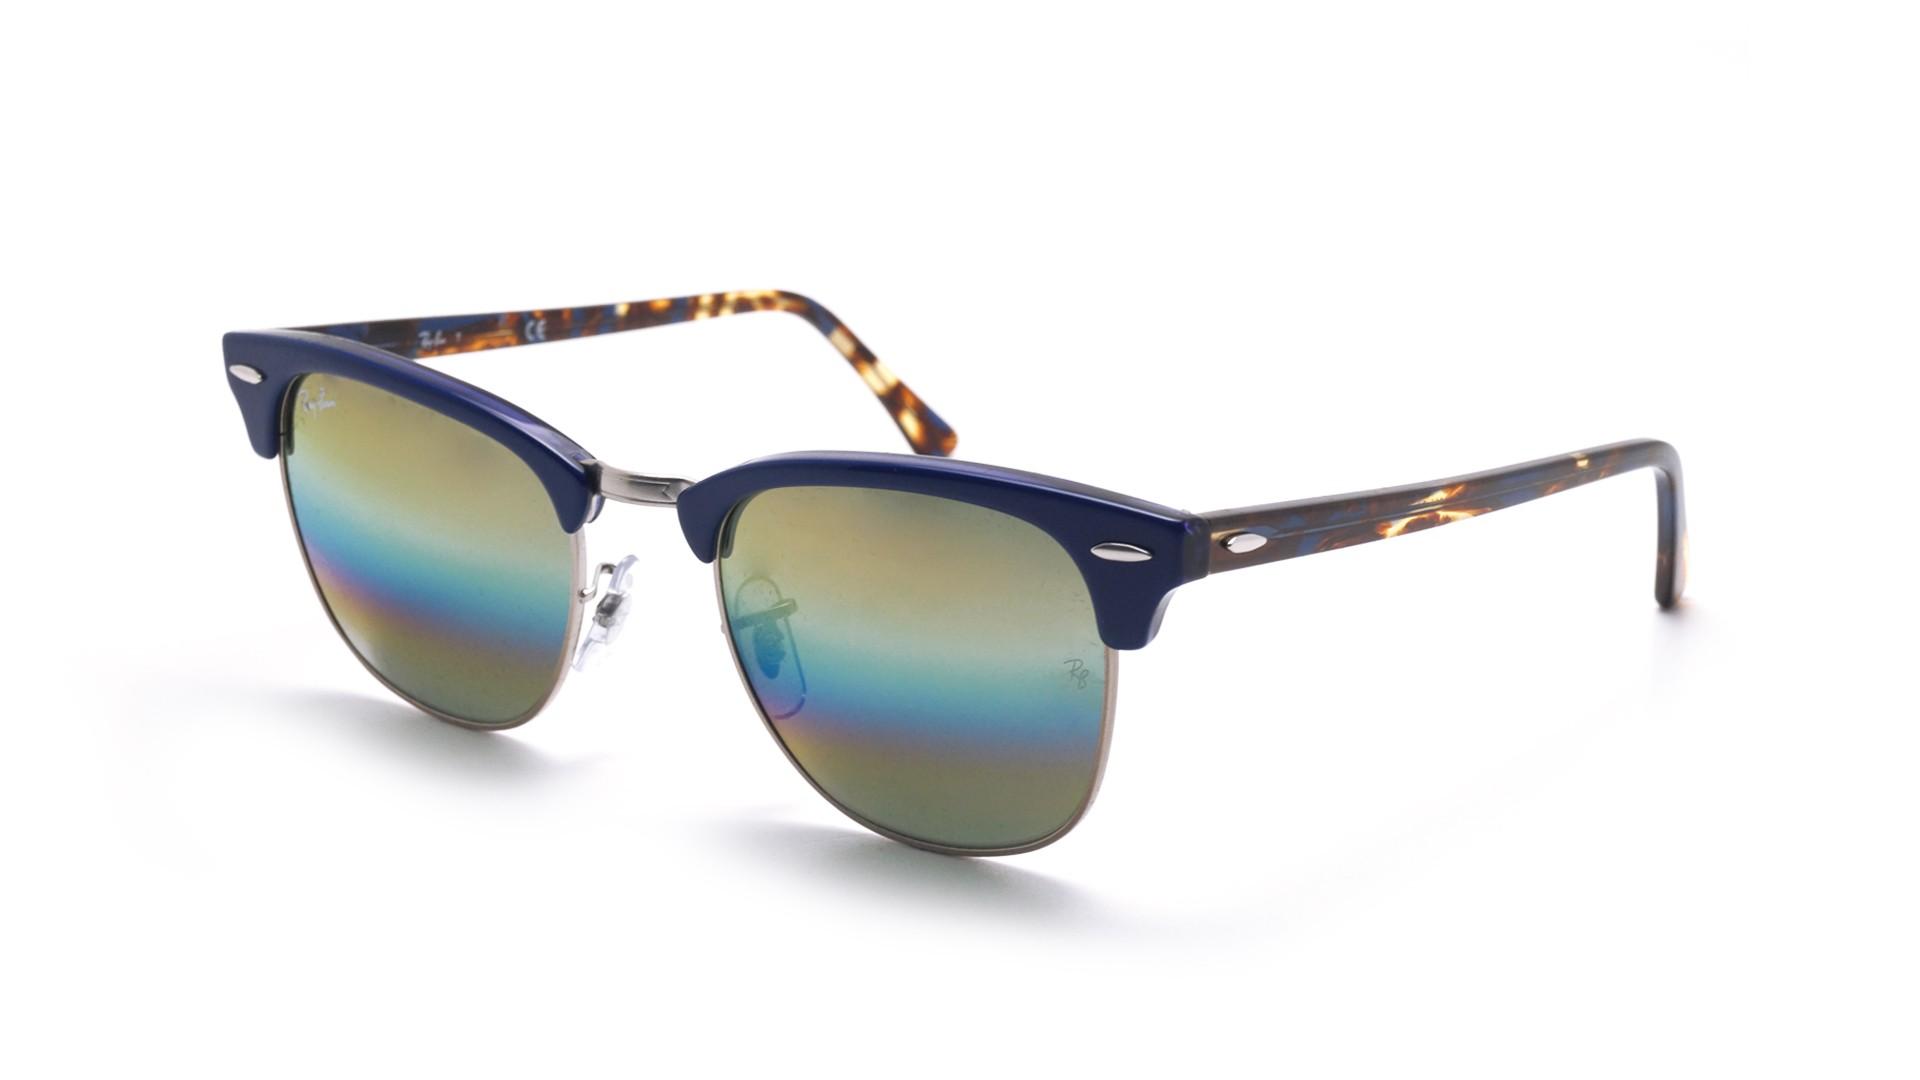 Sunglasses Ray-Ban Clubmaster Blue RB3016 1223 C4 51-21 Medium Gradient  Mirror 2a436b7580dd